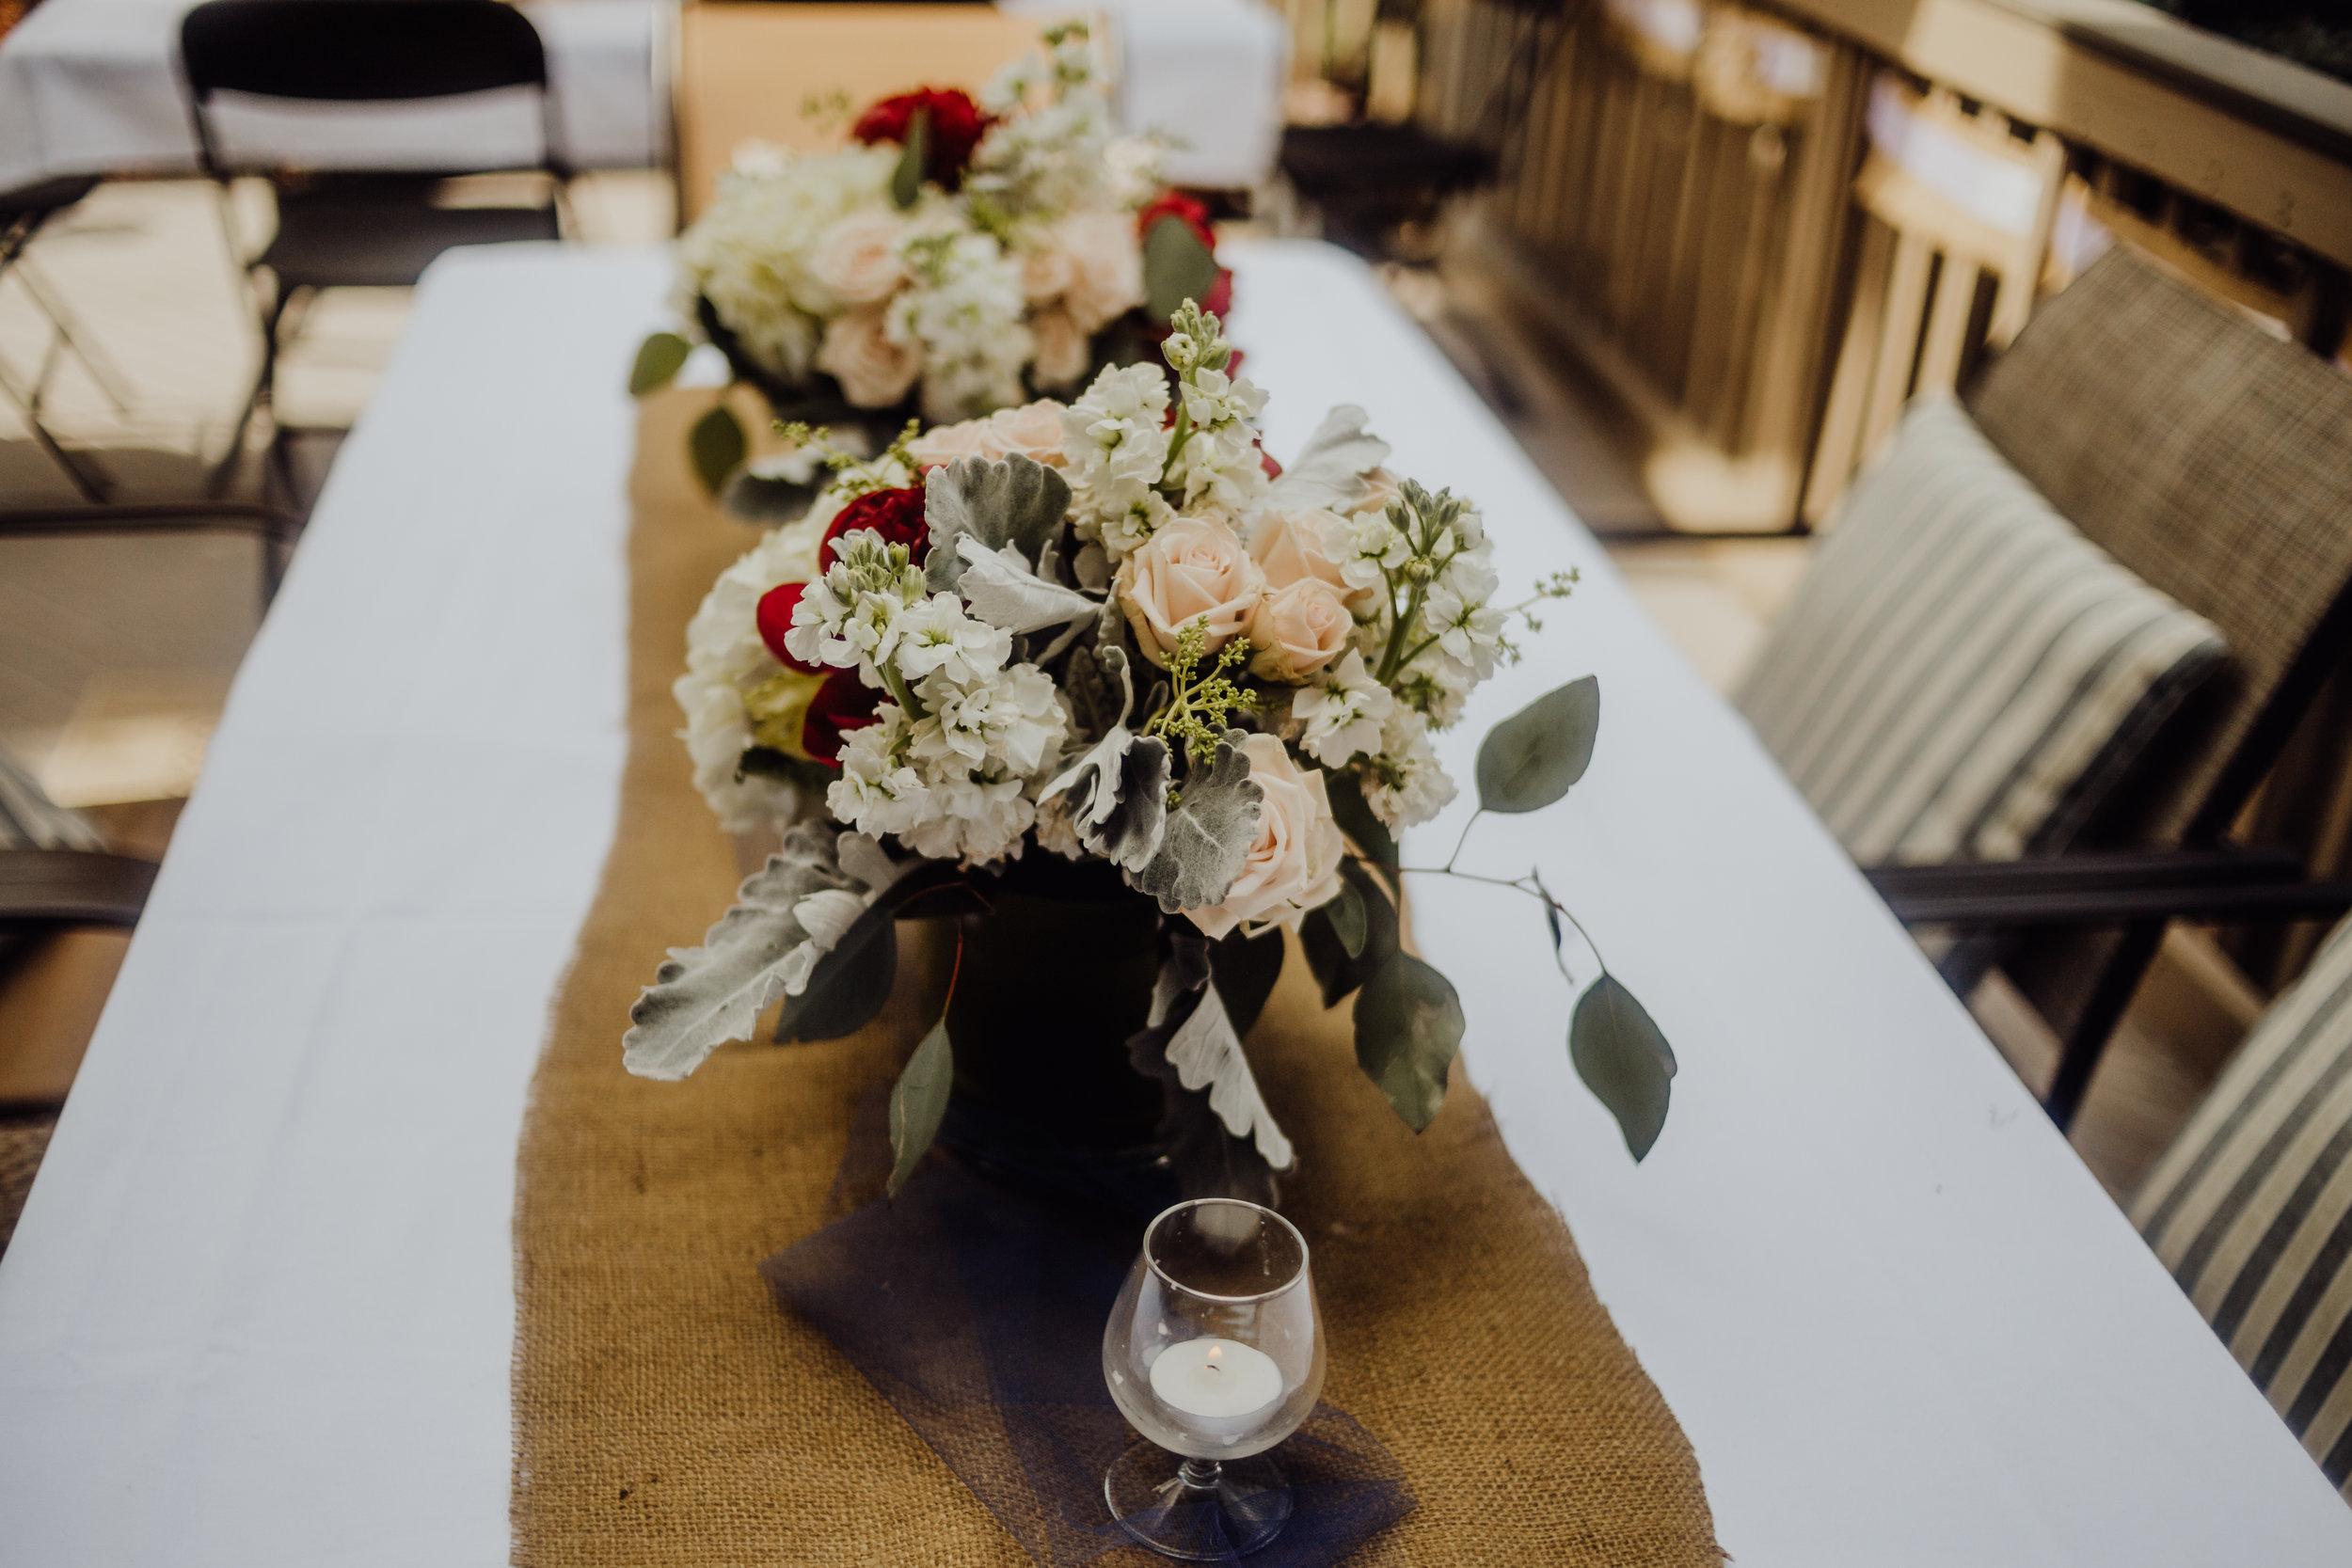 lindsay-arlene-photography-bridal-shower(7of106).jpg